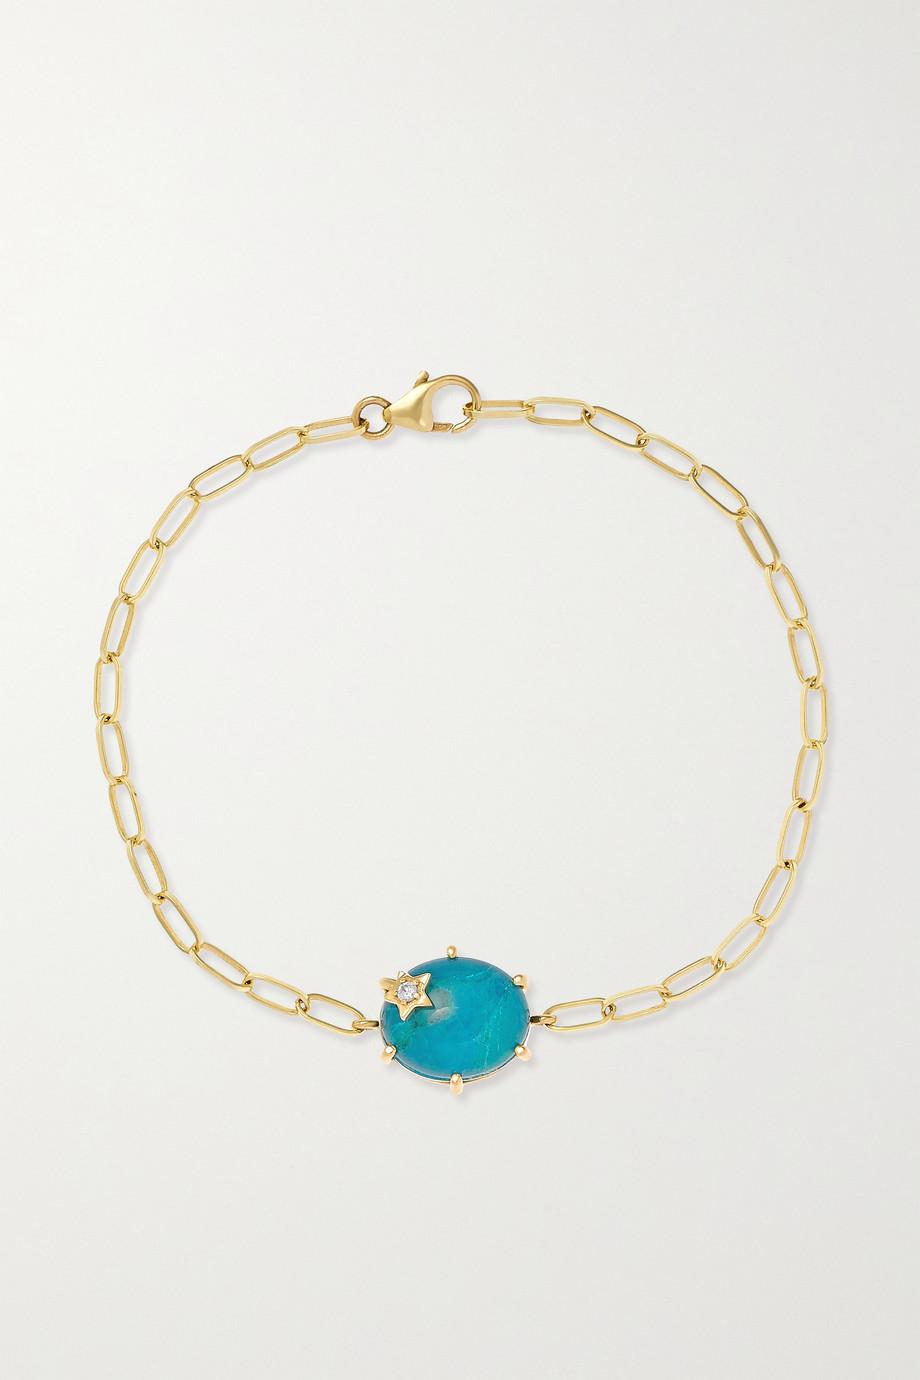 Andrea Fohrman Mini Galaxy 14-karat gold multi-stone doublet bracelet